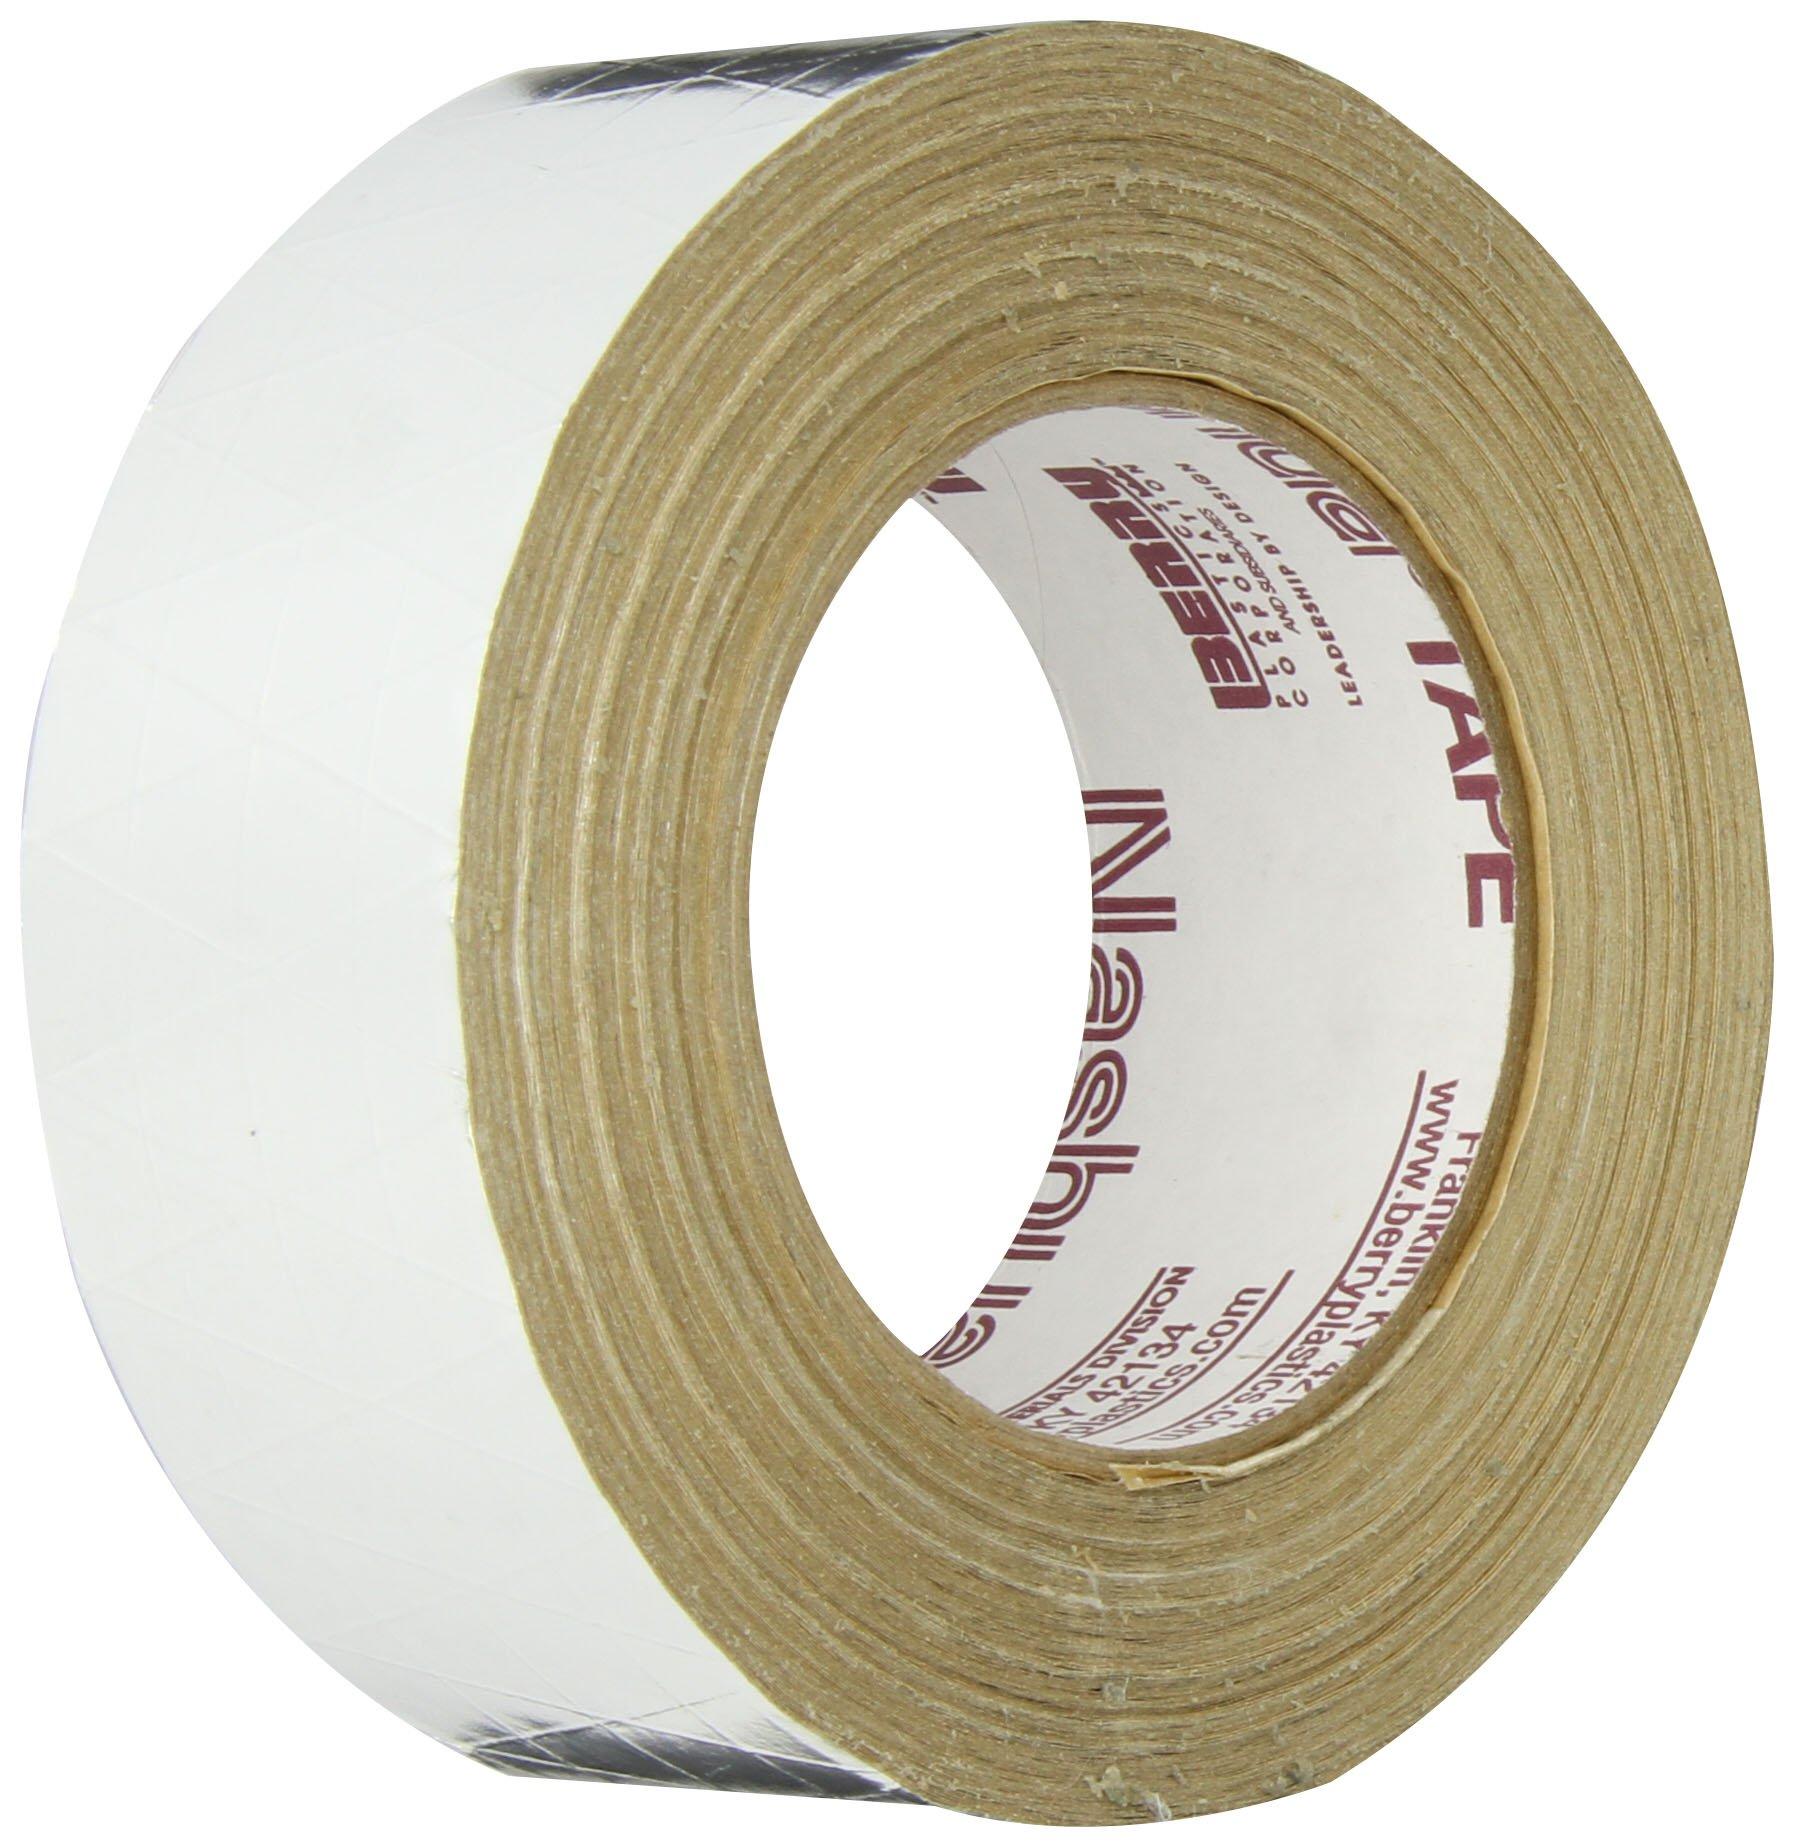 Nashua FSK Foil-Scrim-Kraft Insulation Jacketing Tape, 46m Length x 48mm Width, Aluminum